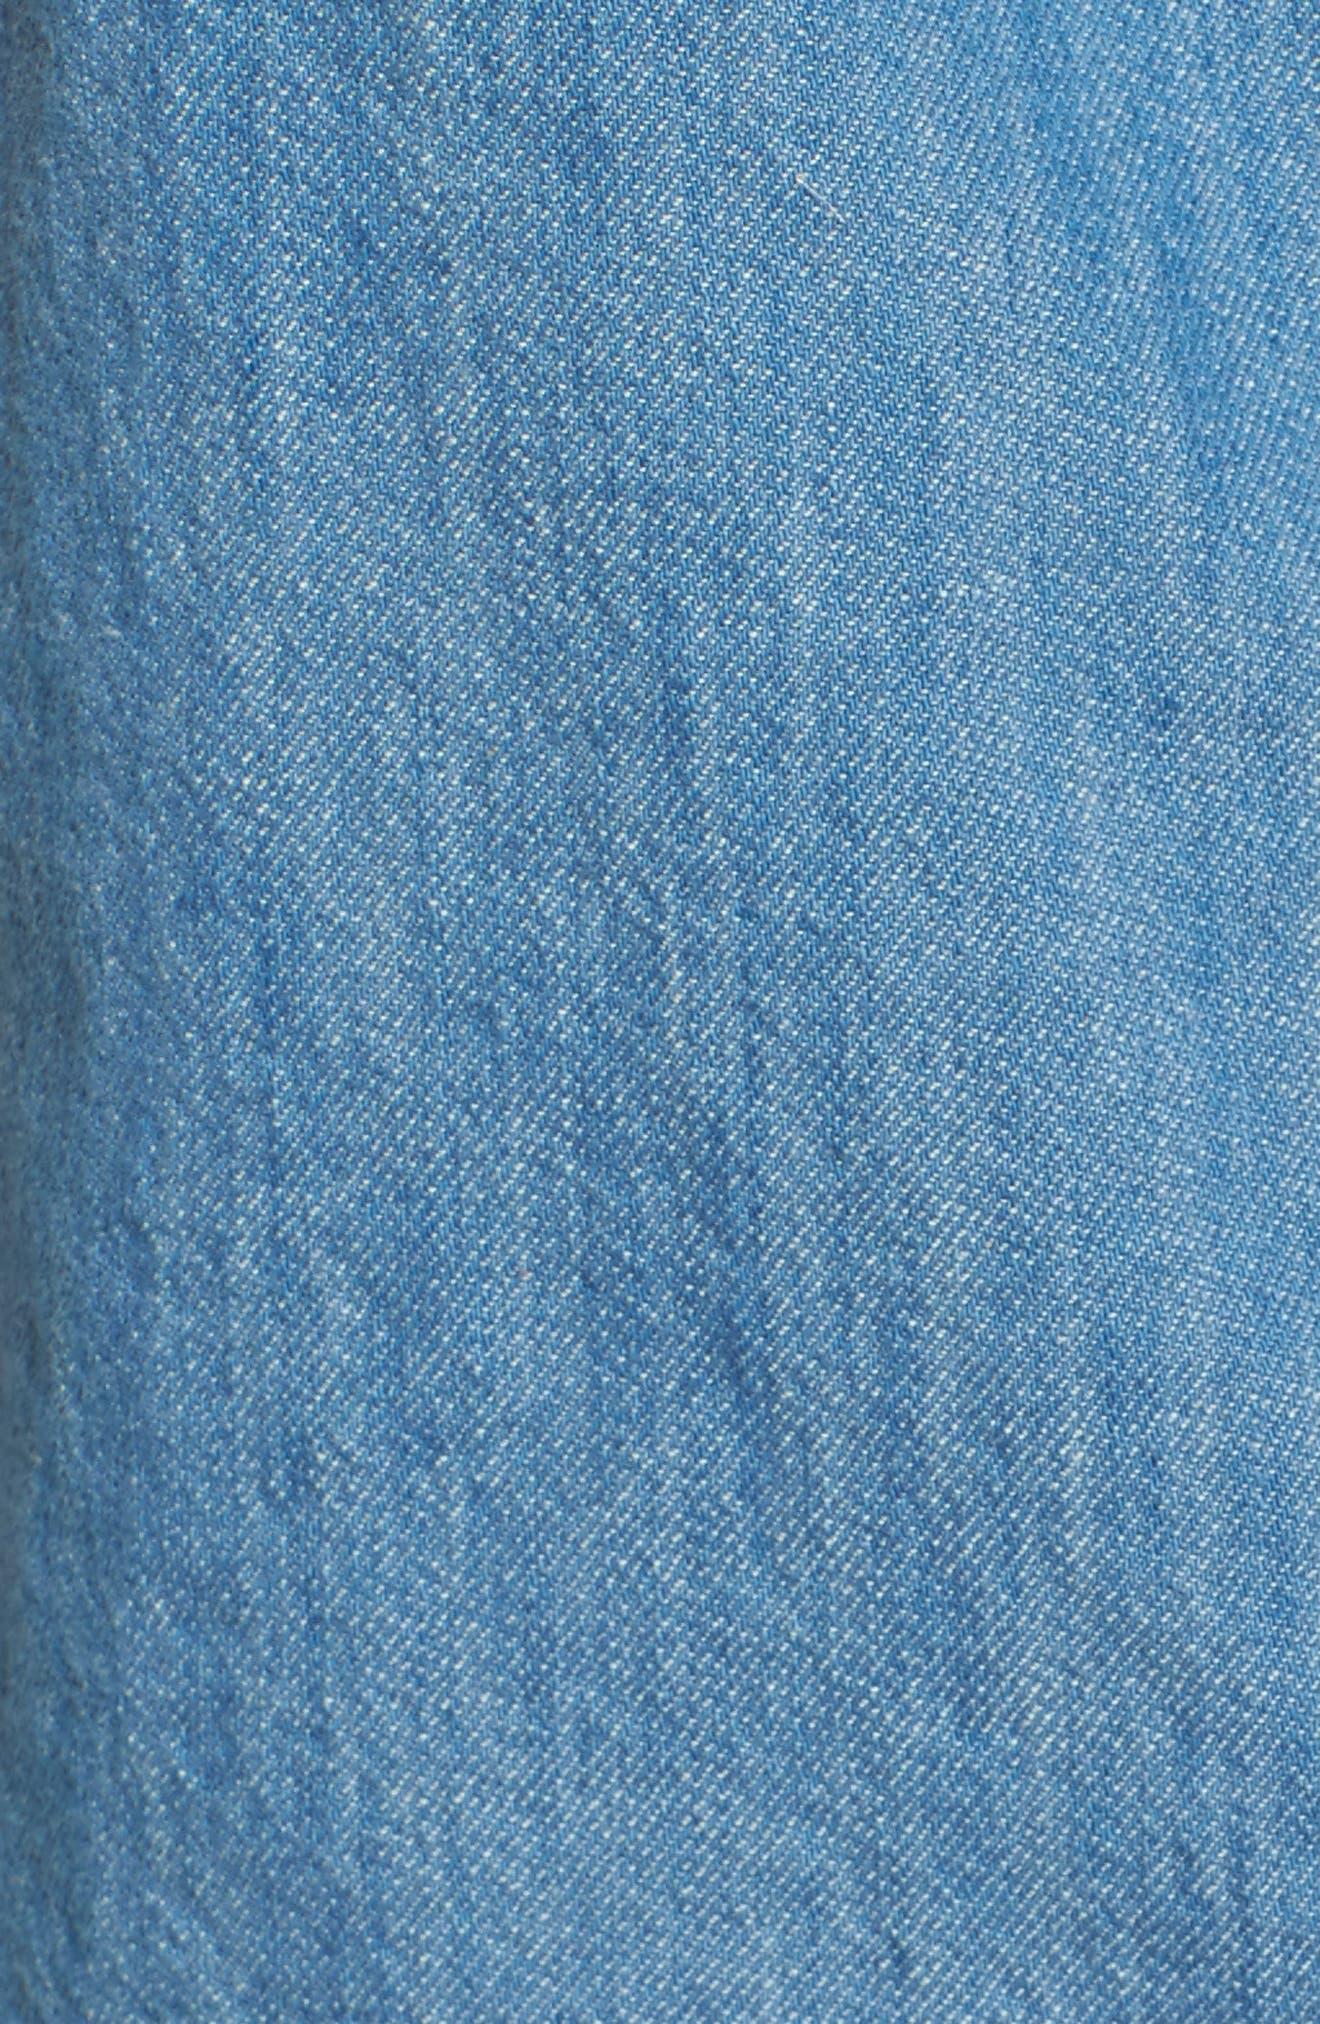 Asymmetrical Raw Edge Denim Top,                             Alternate thumbnail 5, color,                             420